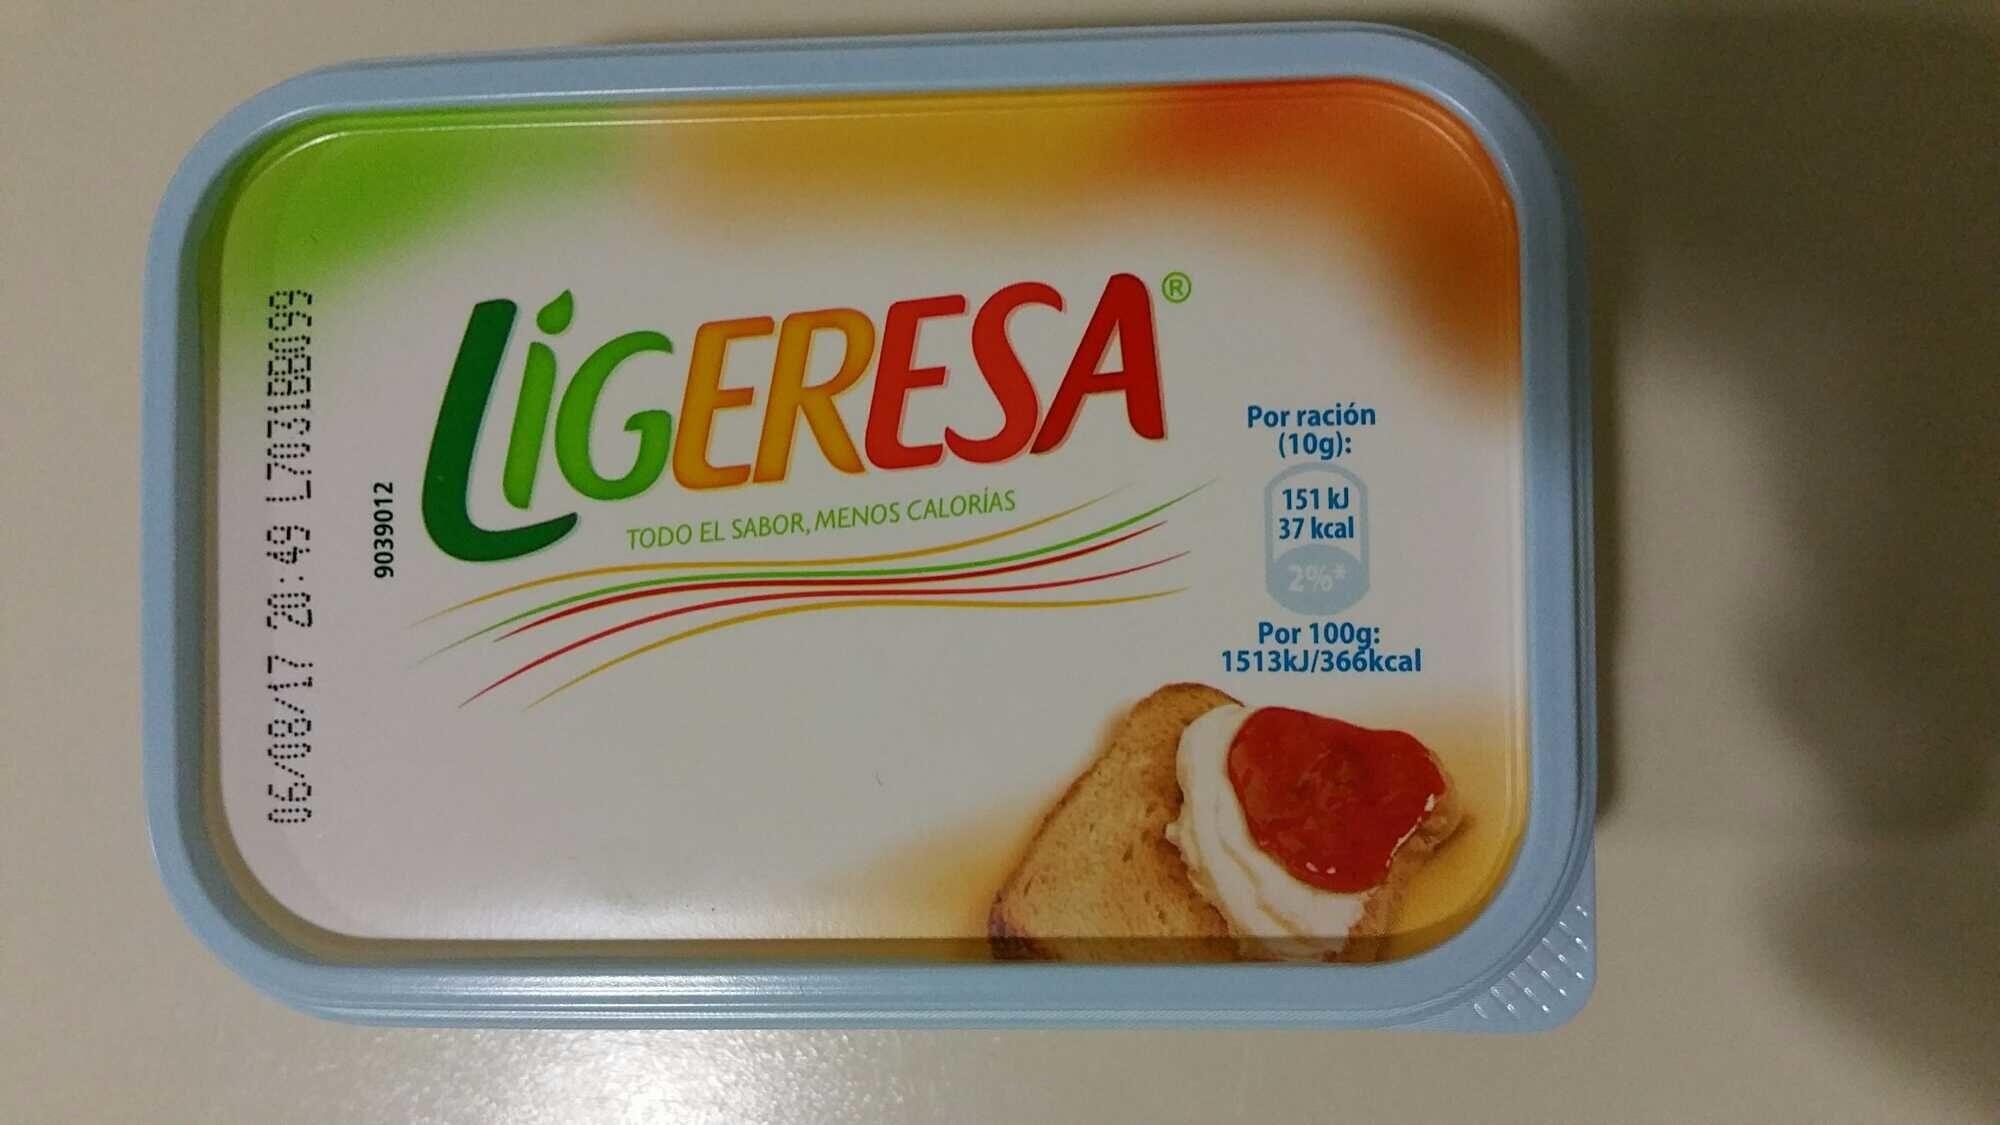 Margarina - Product - es